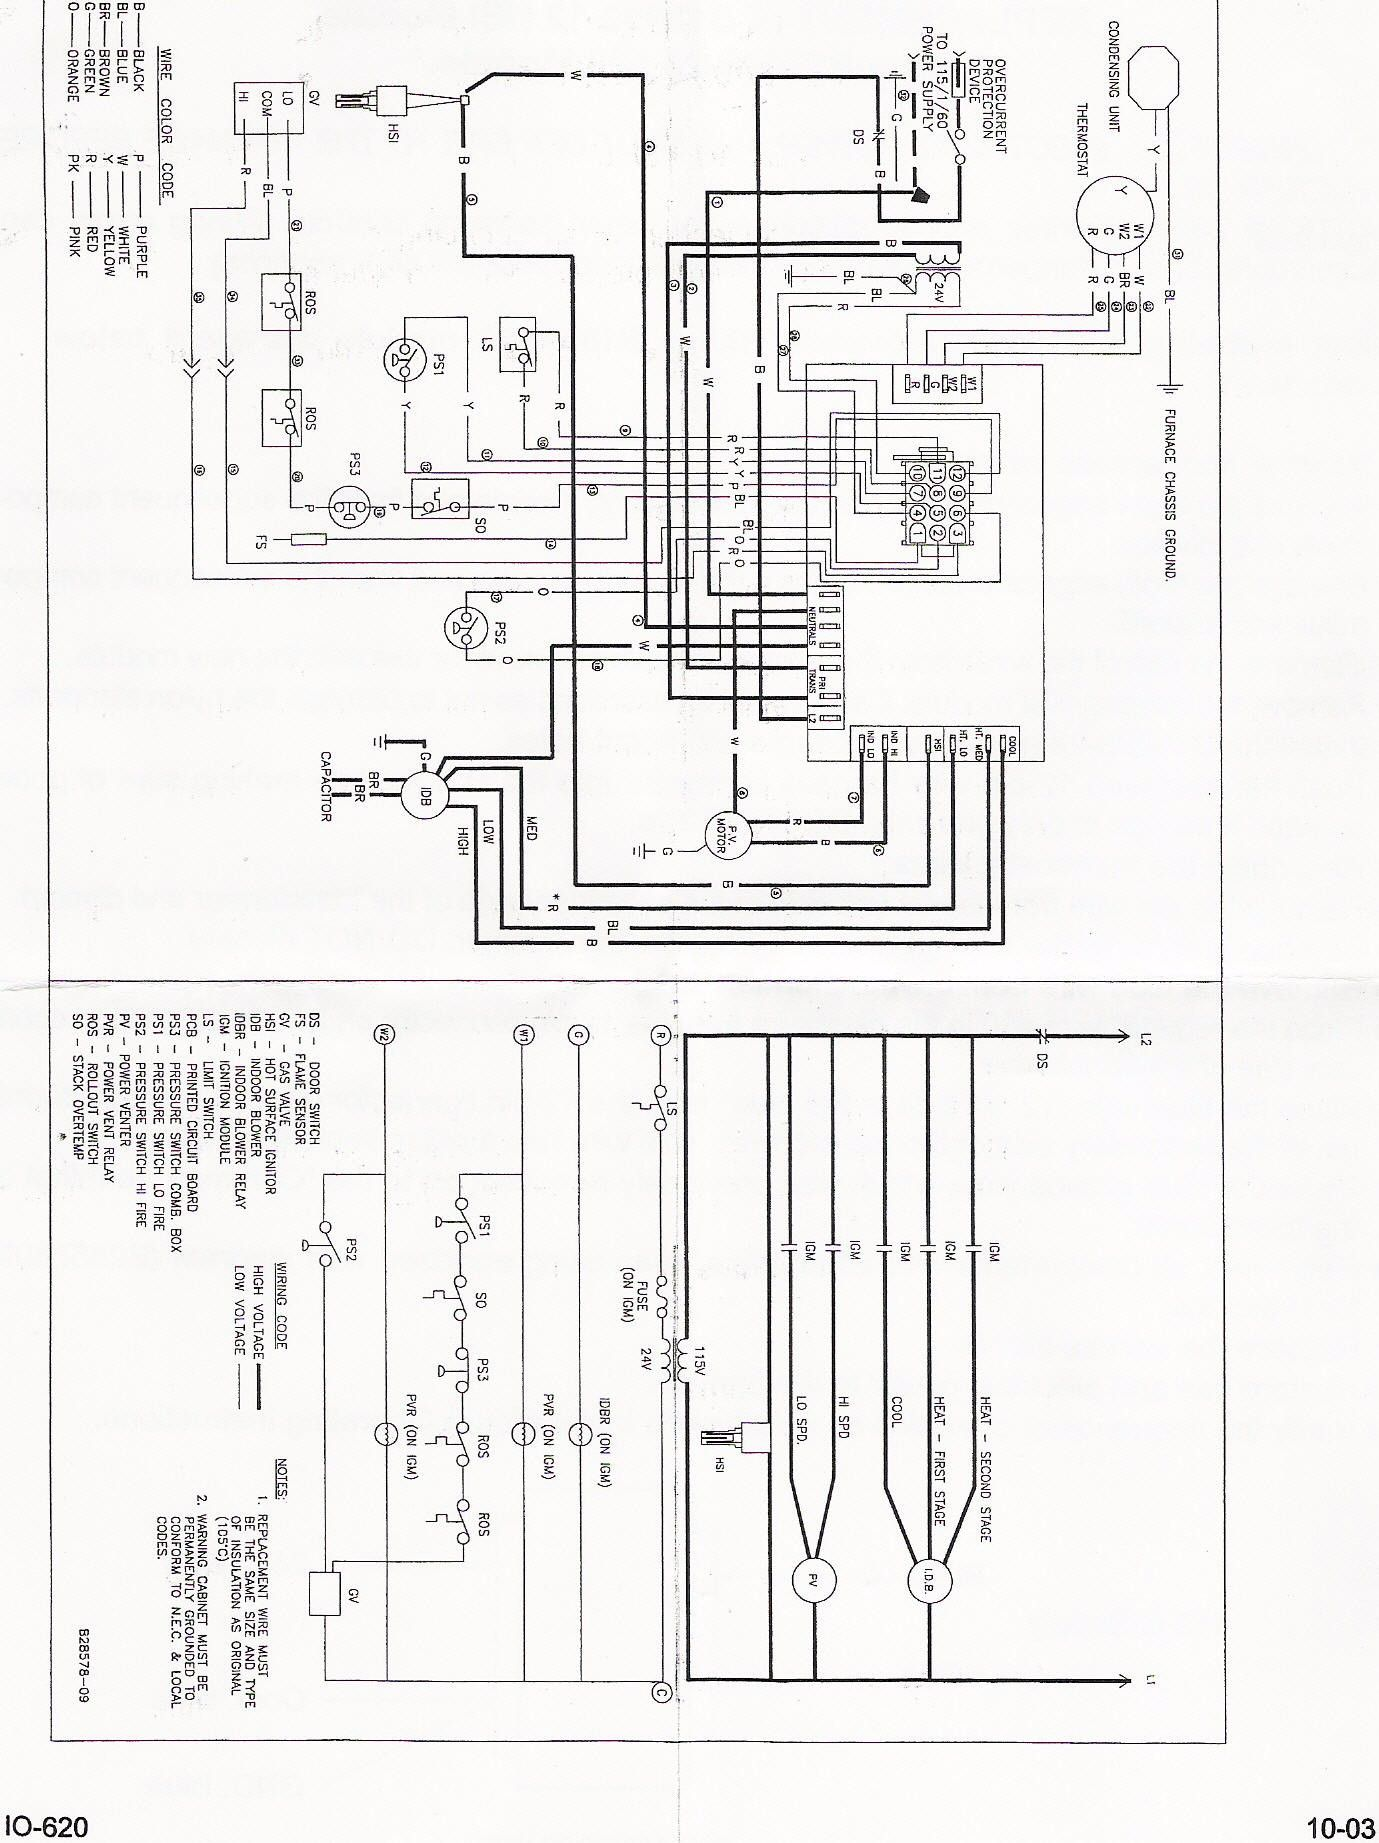 Unique Auto Electrical Diagram Diagram Wiringdiagram